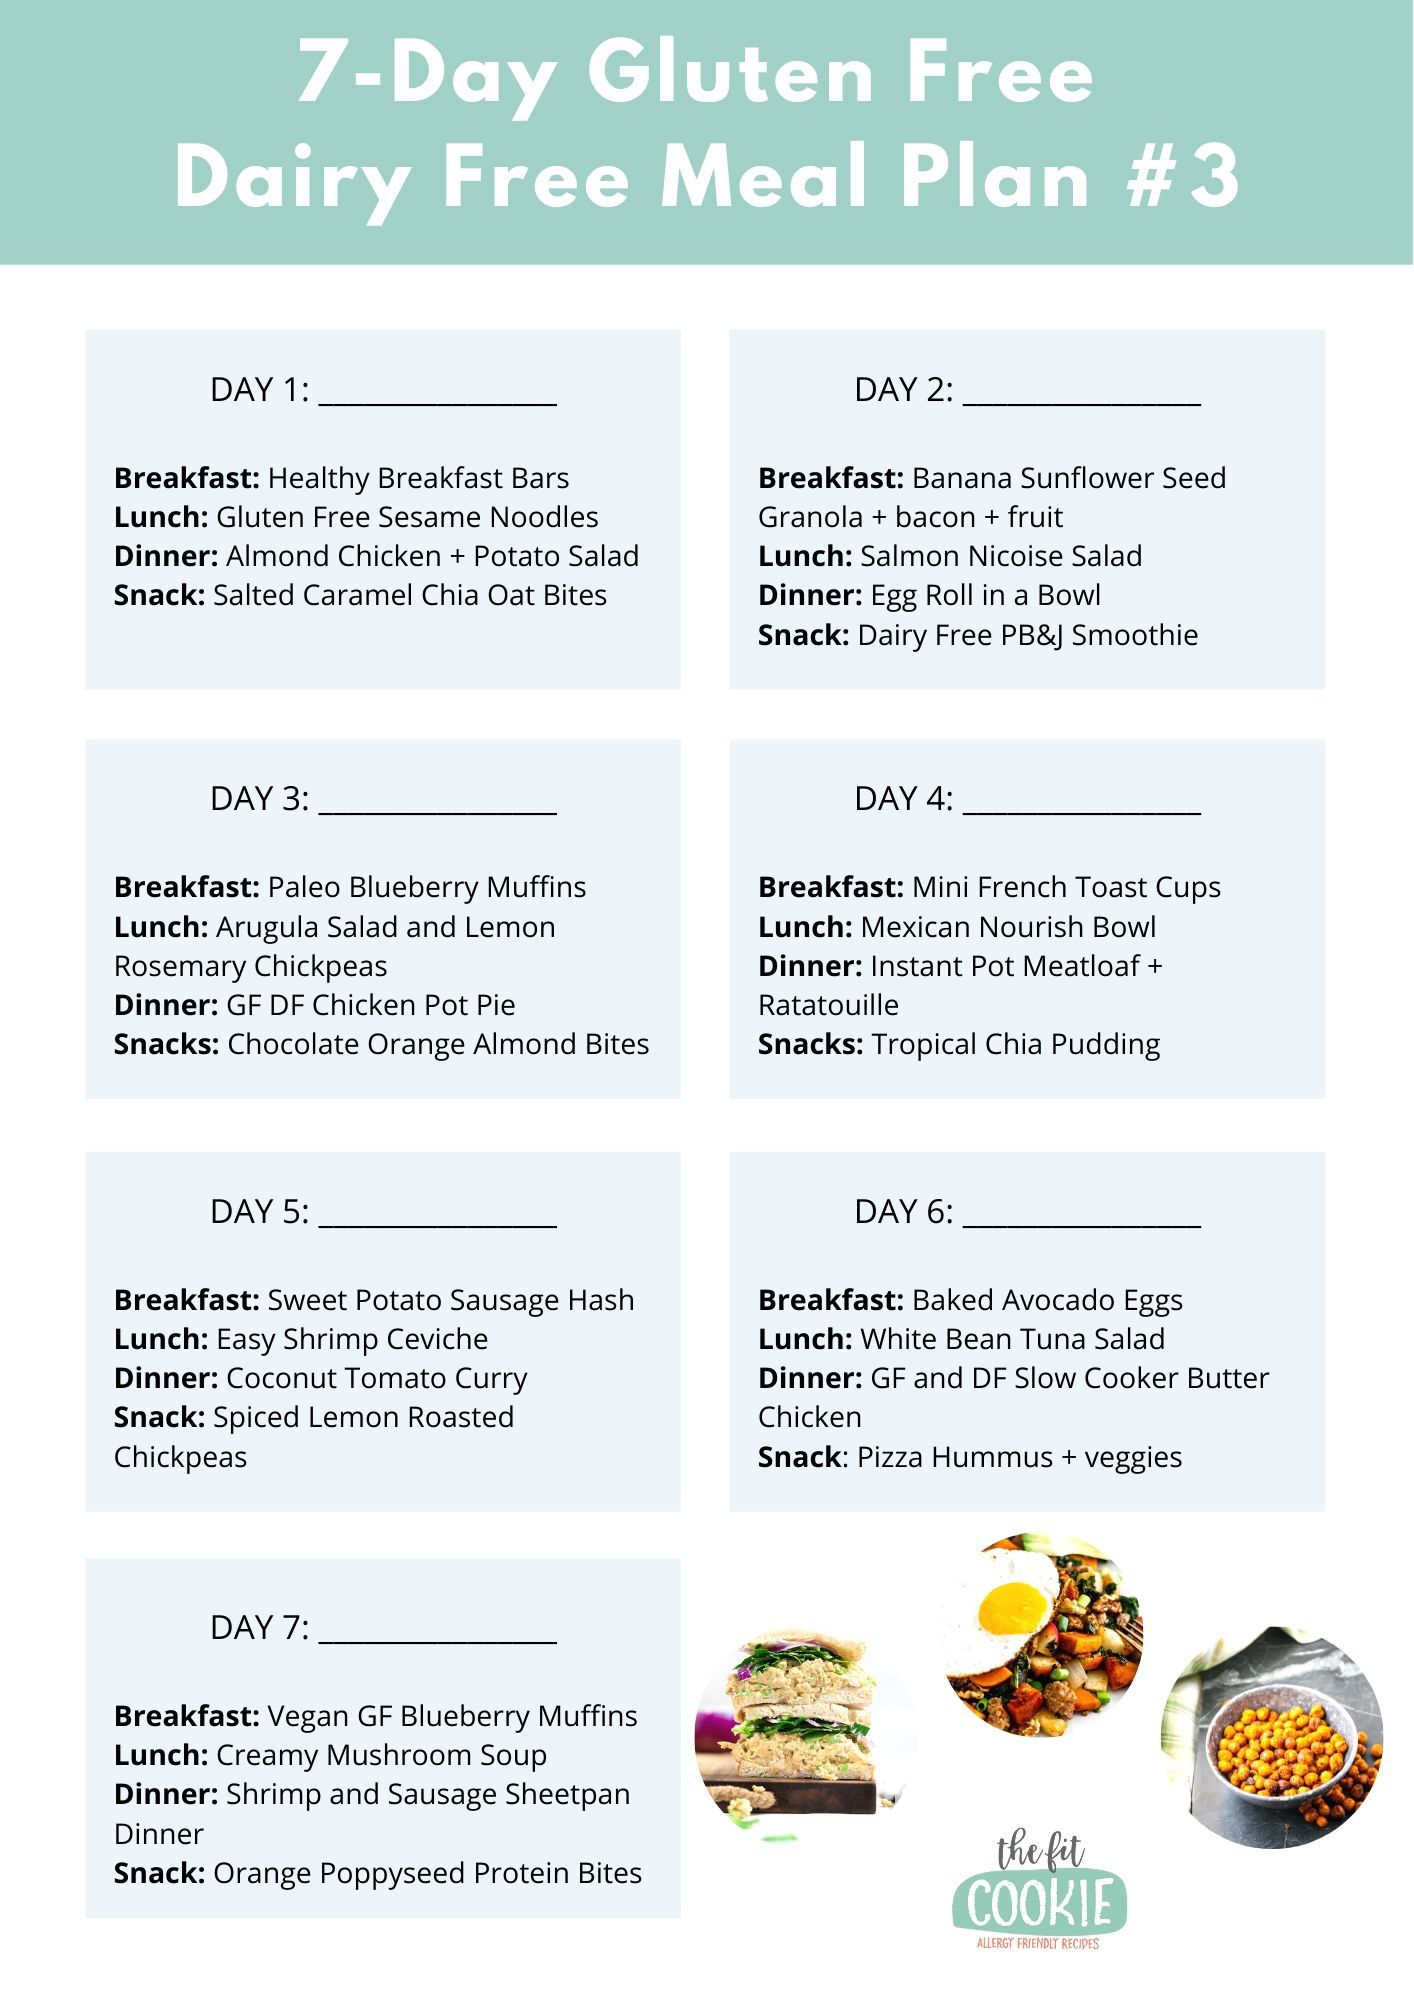 printable menu plan image